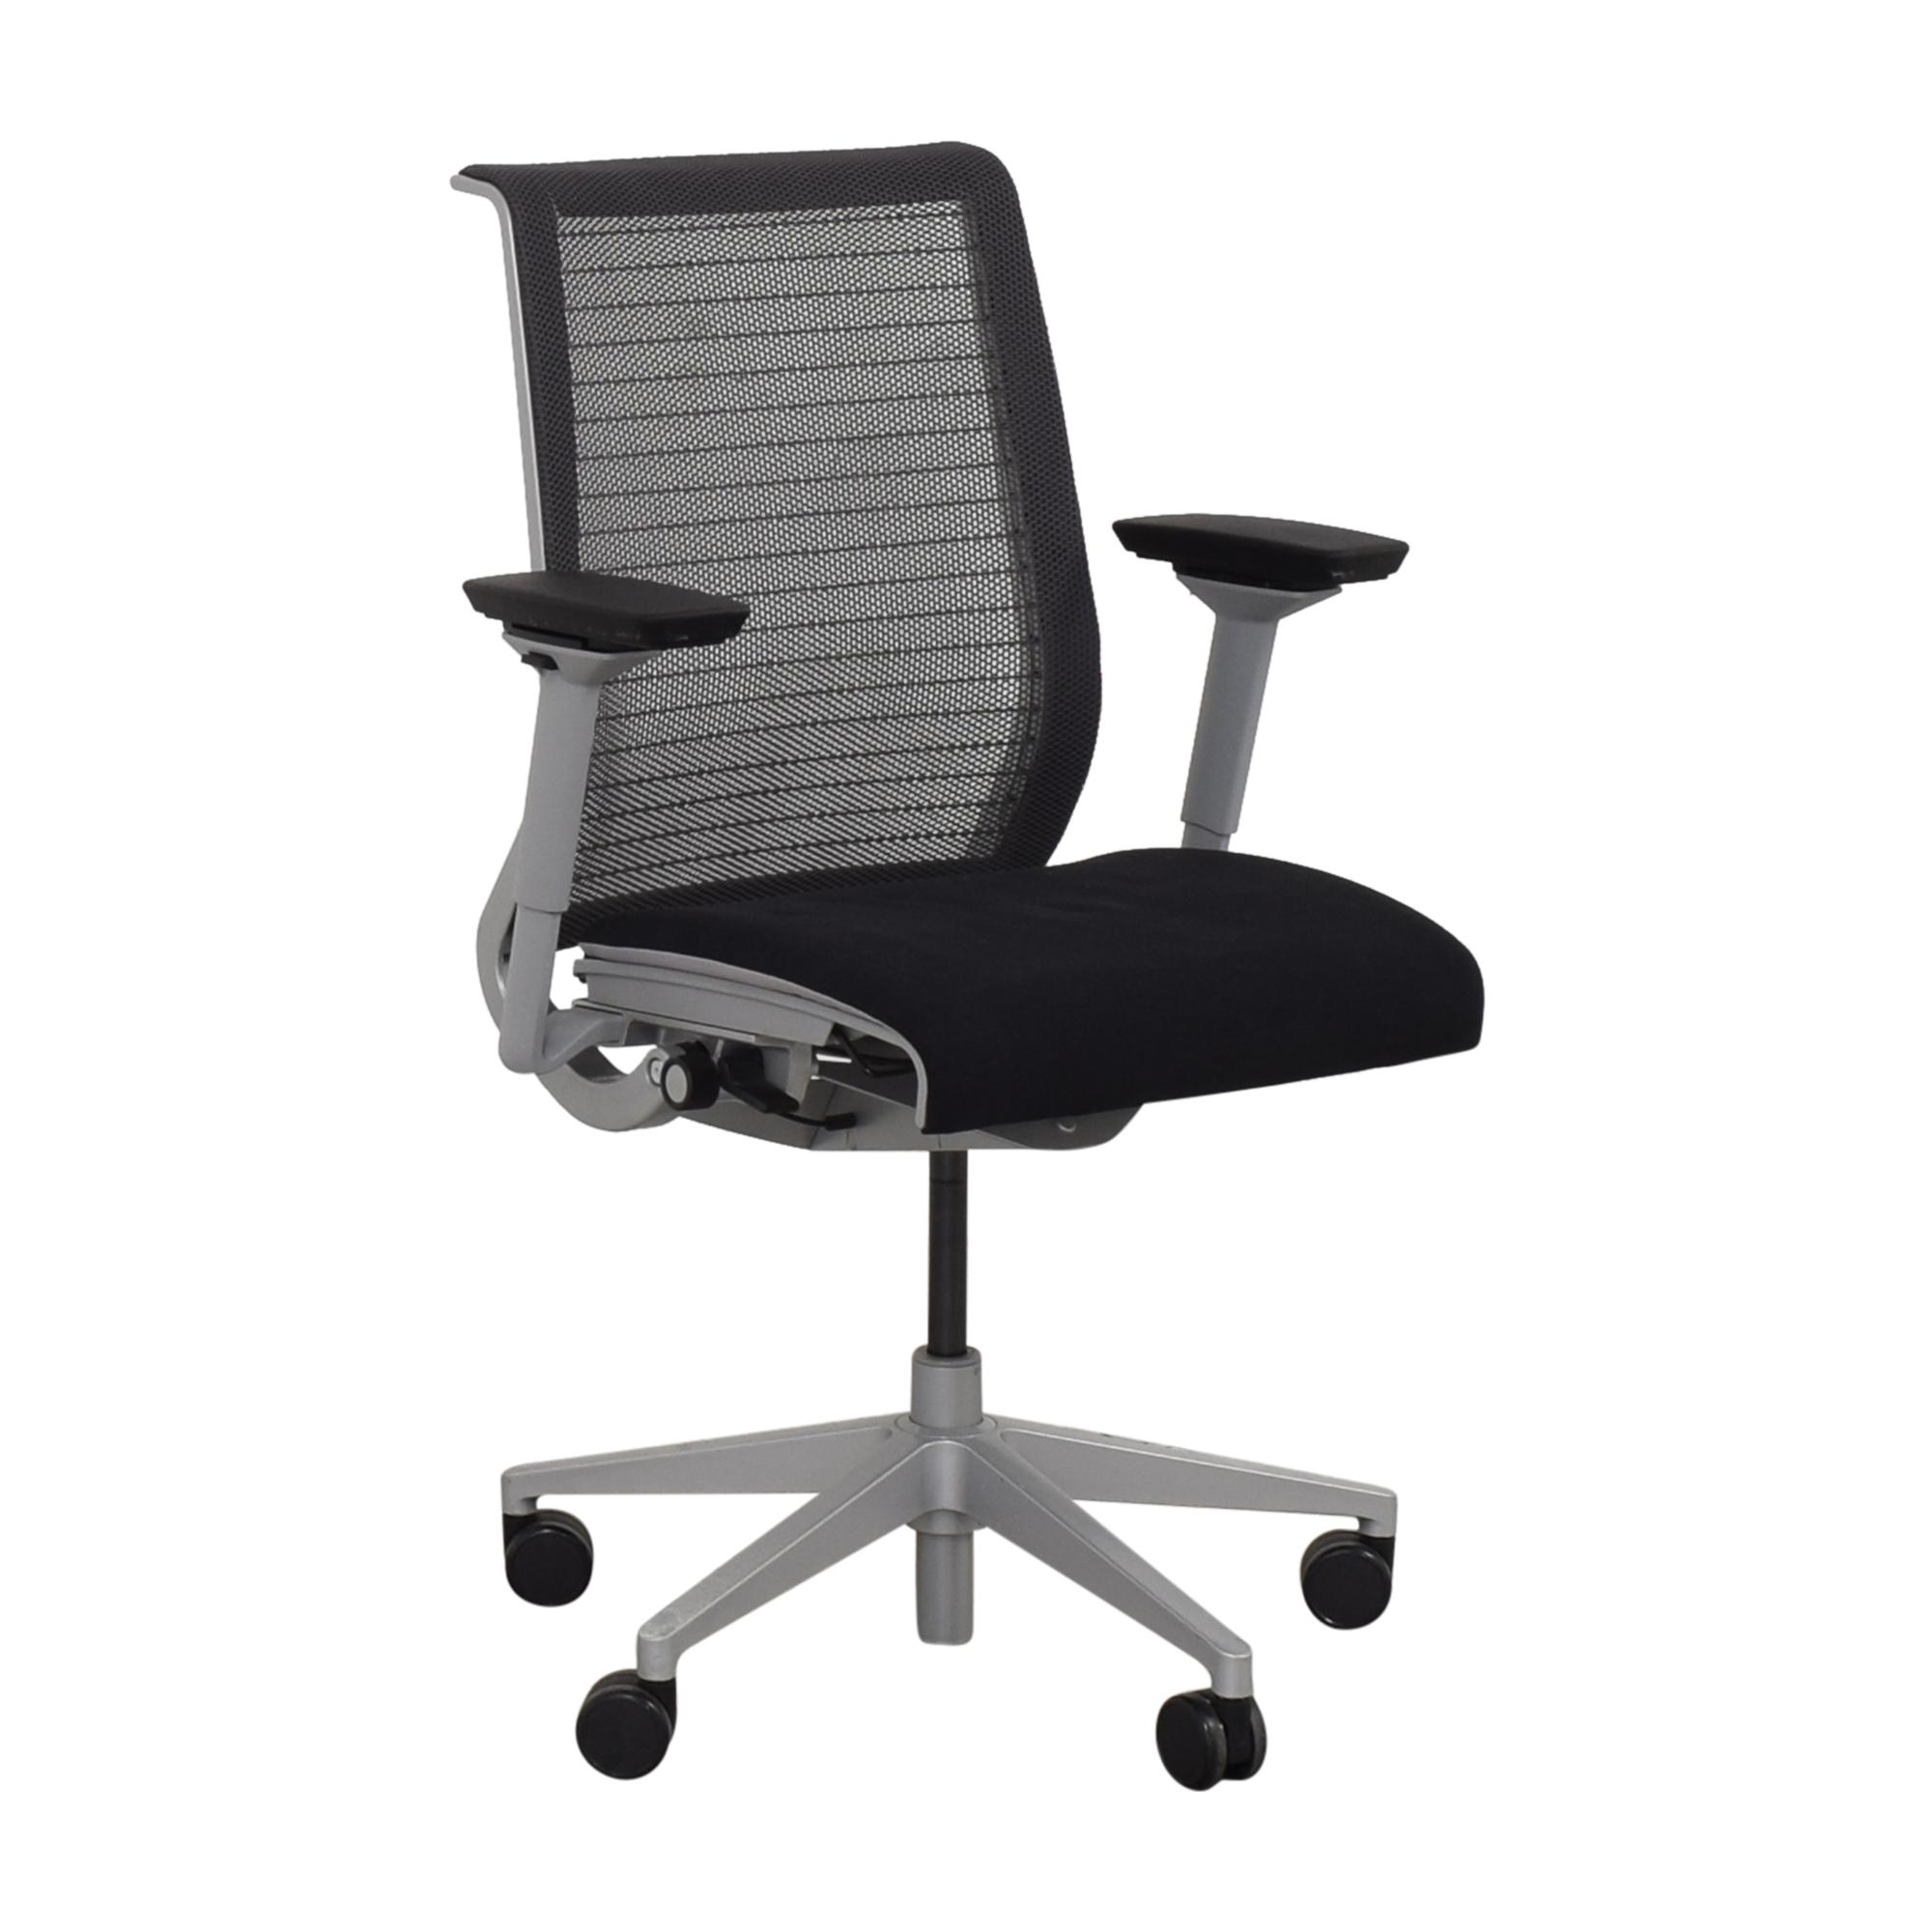 Steelcase Steelcase Cobi Swivel Chair Chairs